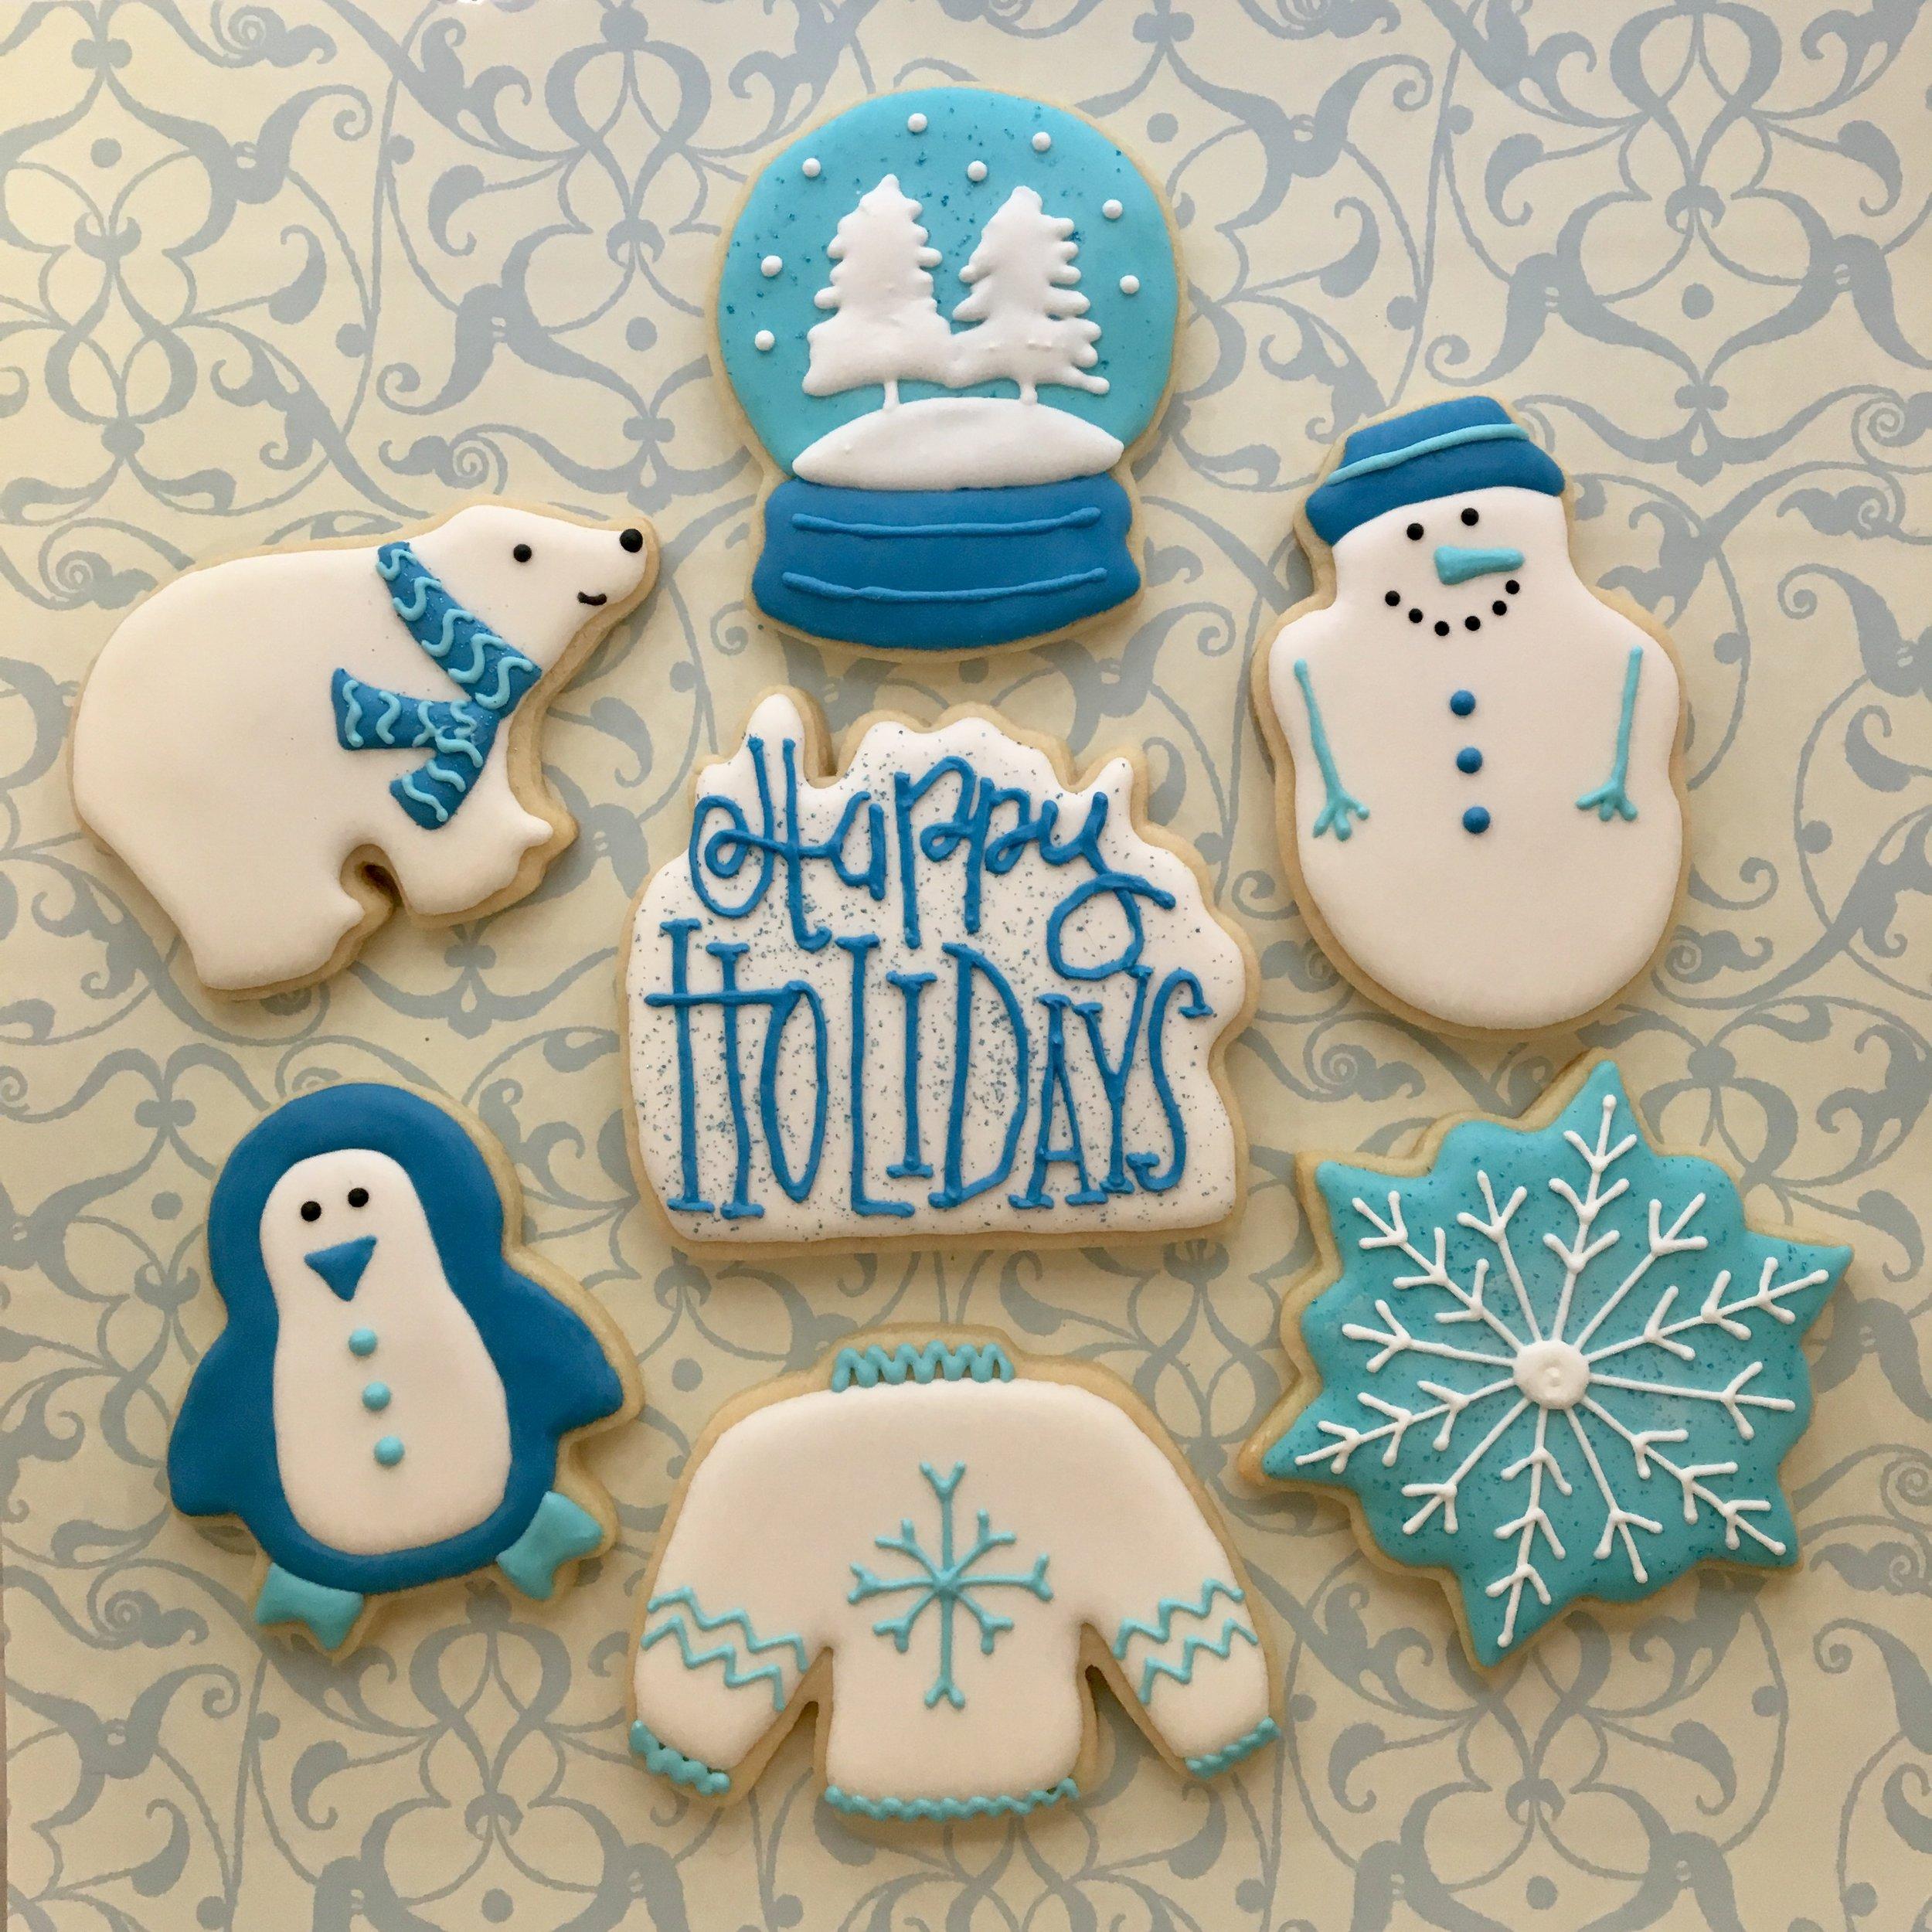 Winter Holiday Sugar Cookies